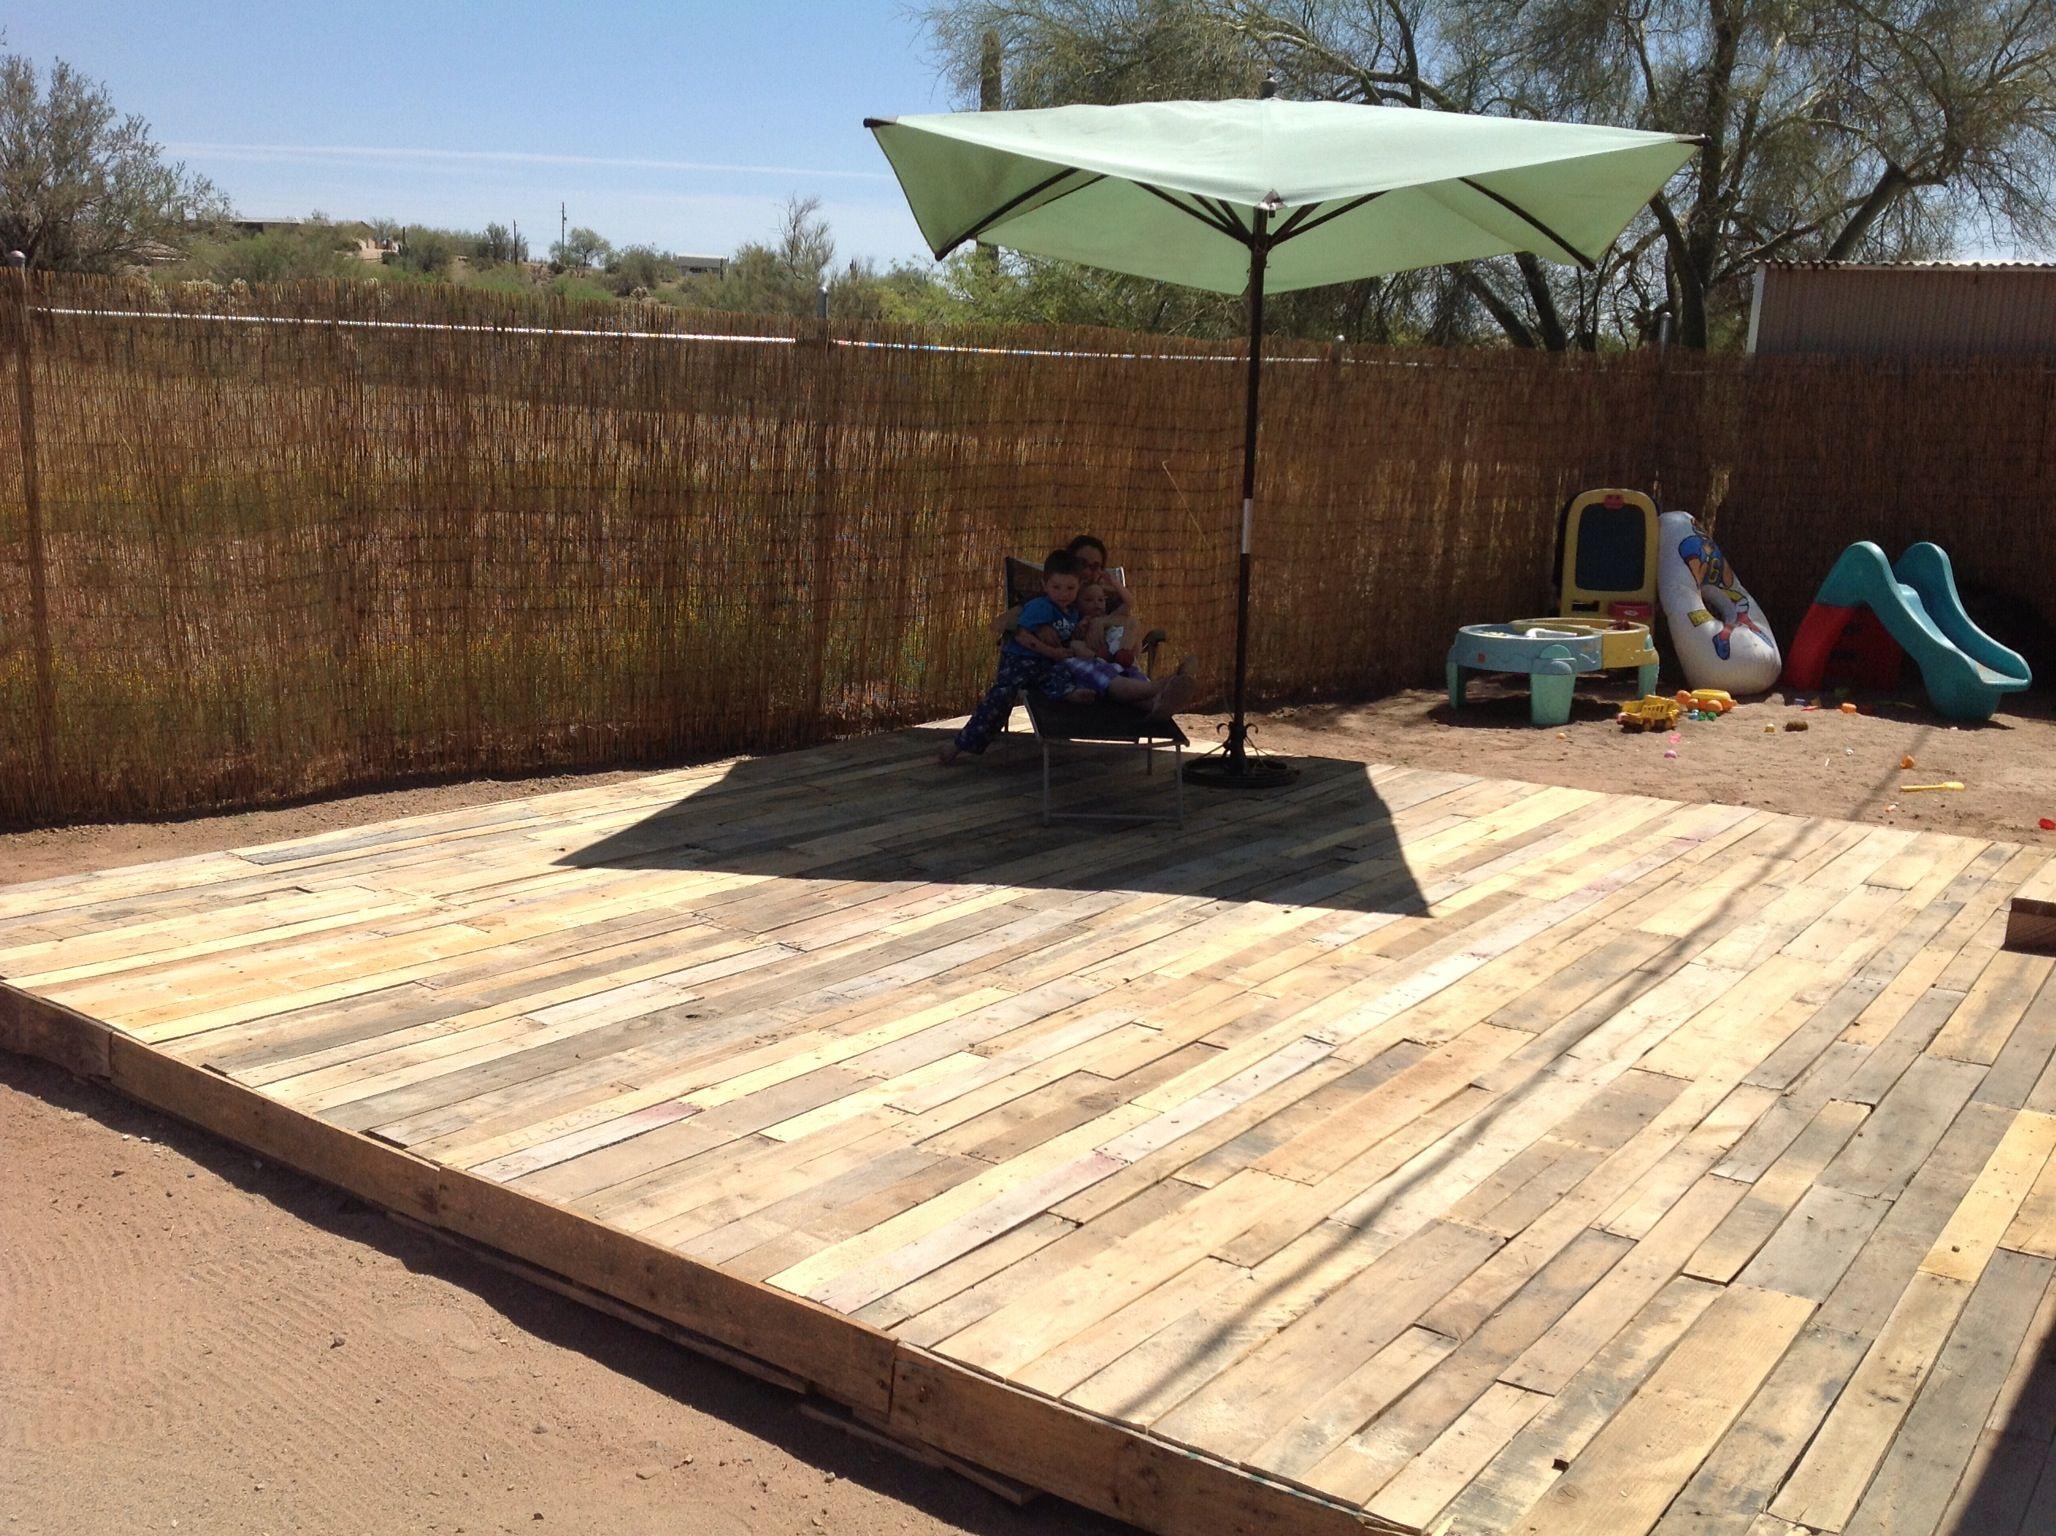 Pedana Di Legno Per Giardino wood pallet deck total cost $7. for saw blades! | pavimento